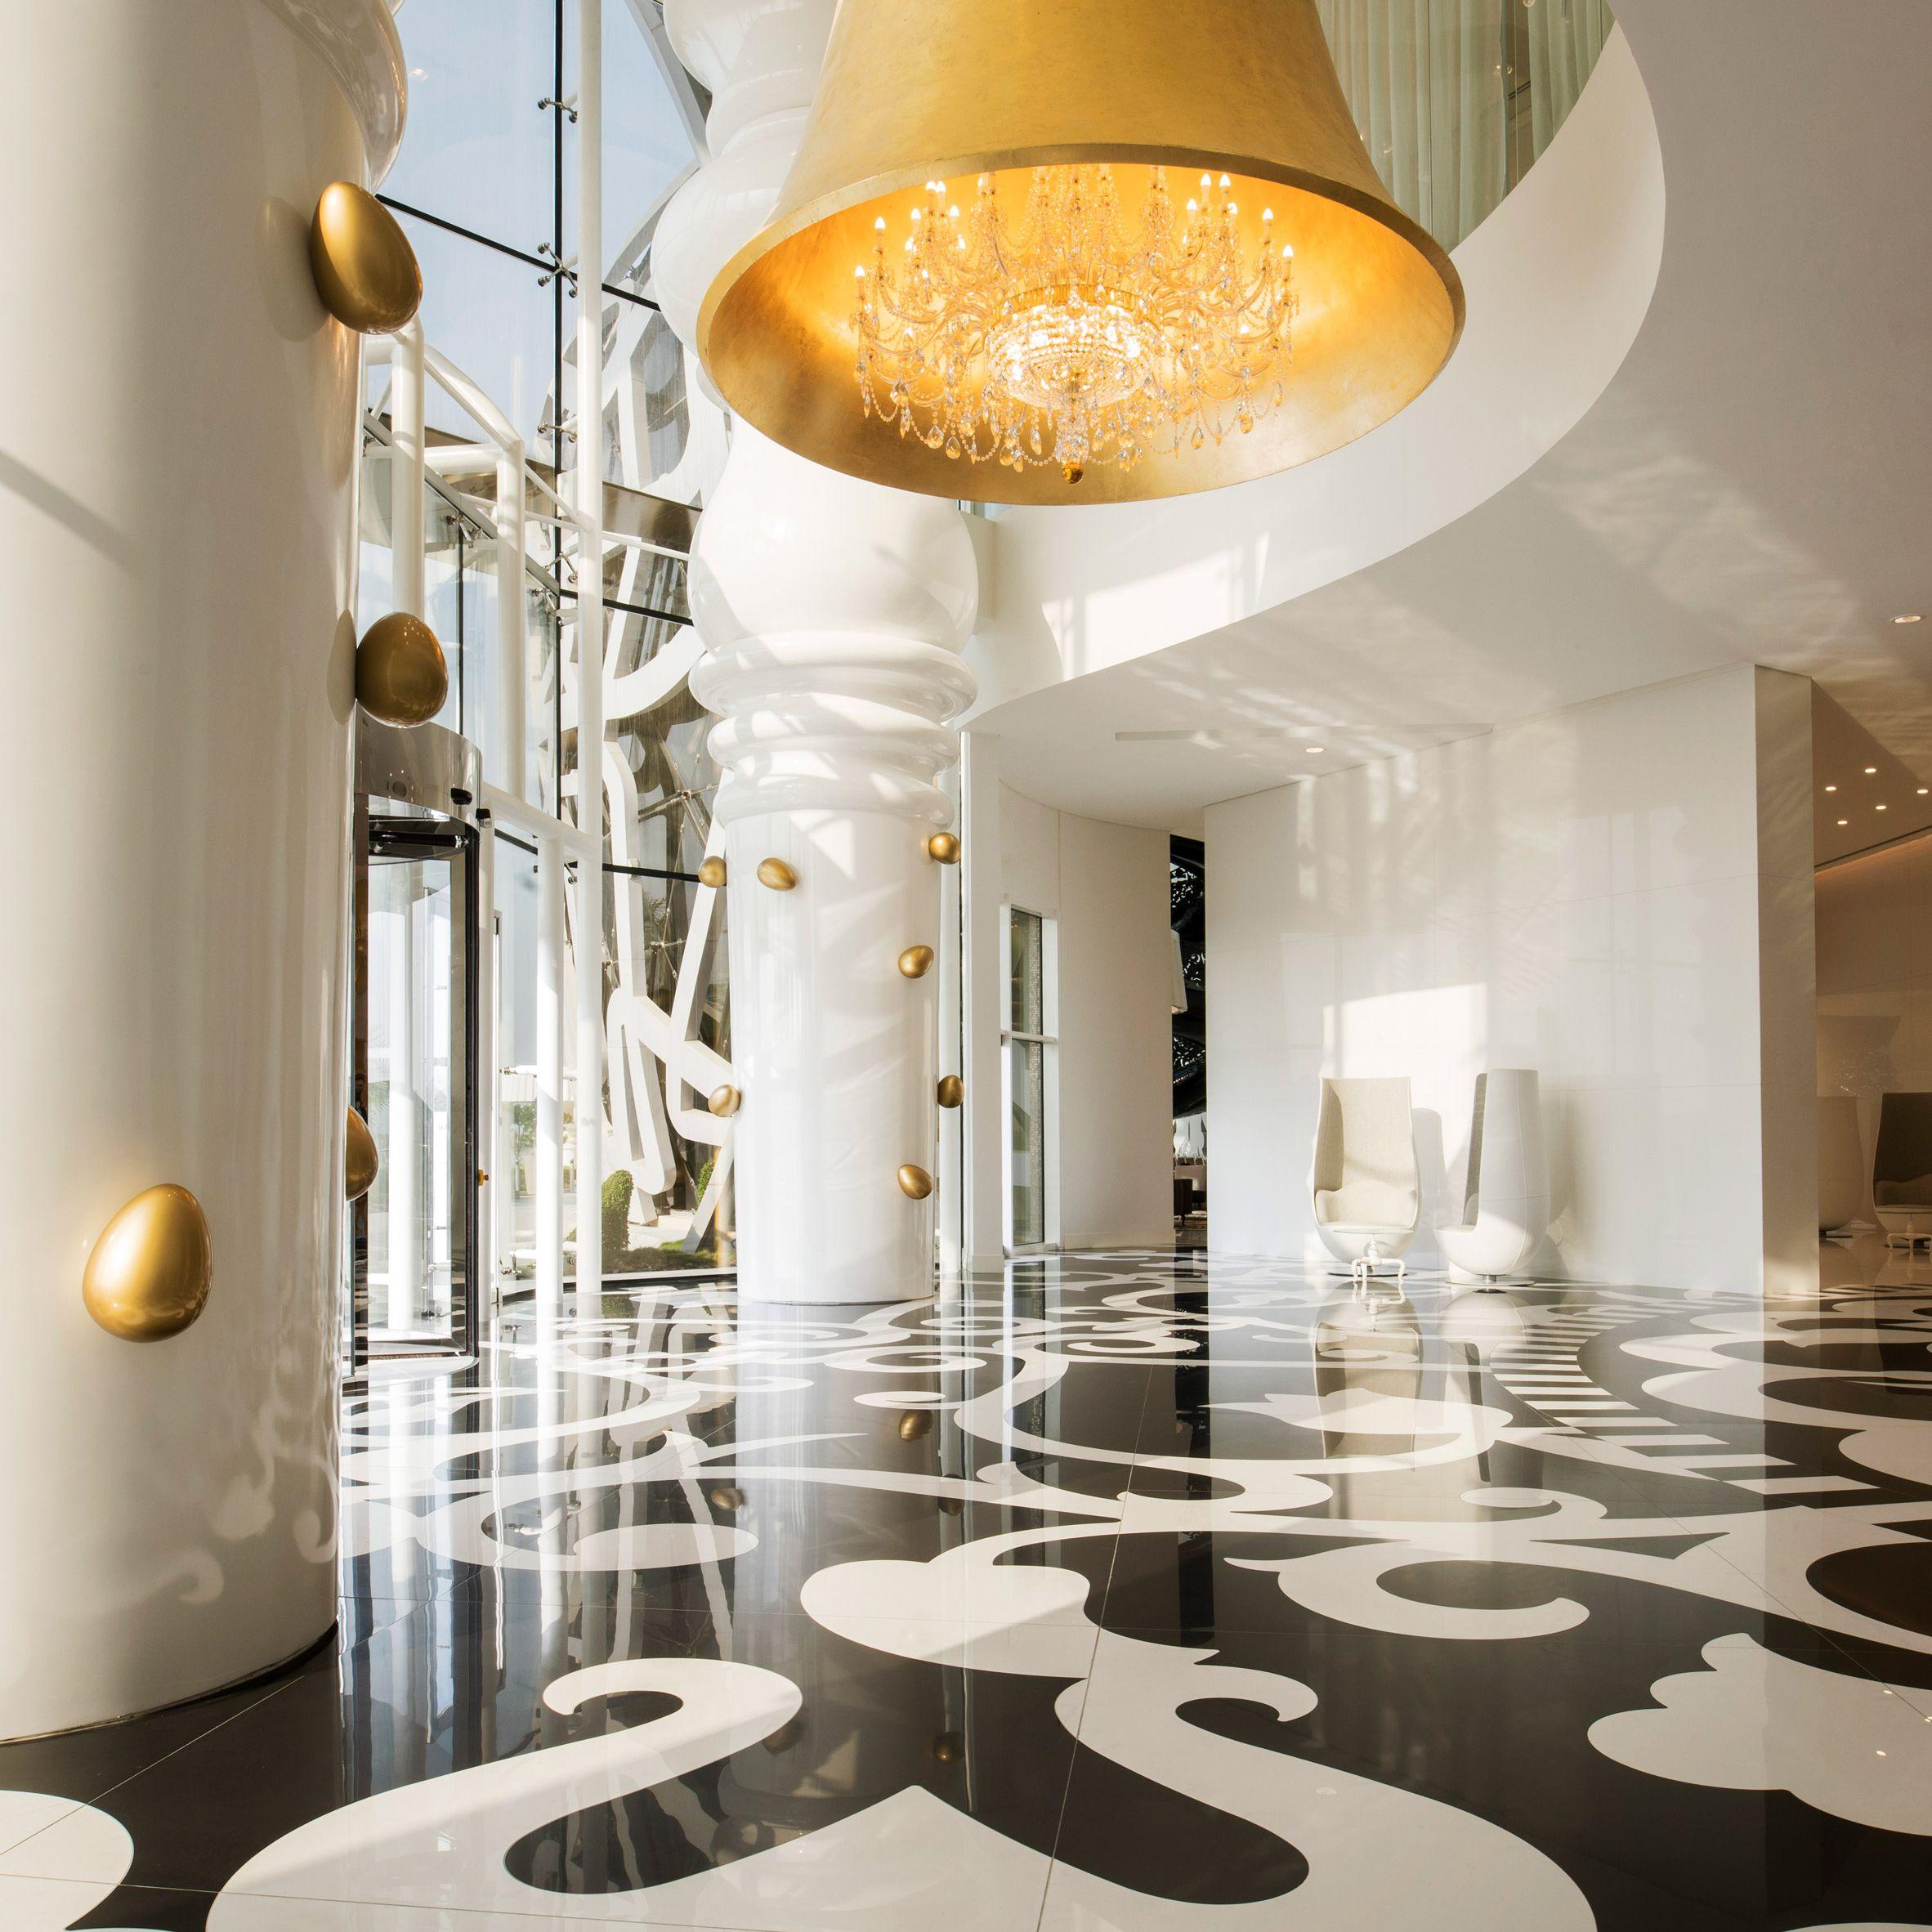 Senior Interior Designer At Marcel Wanders In Amsterdam